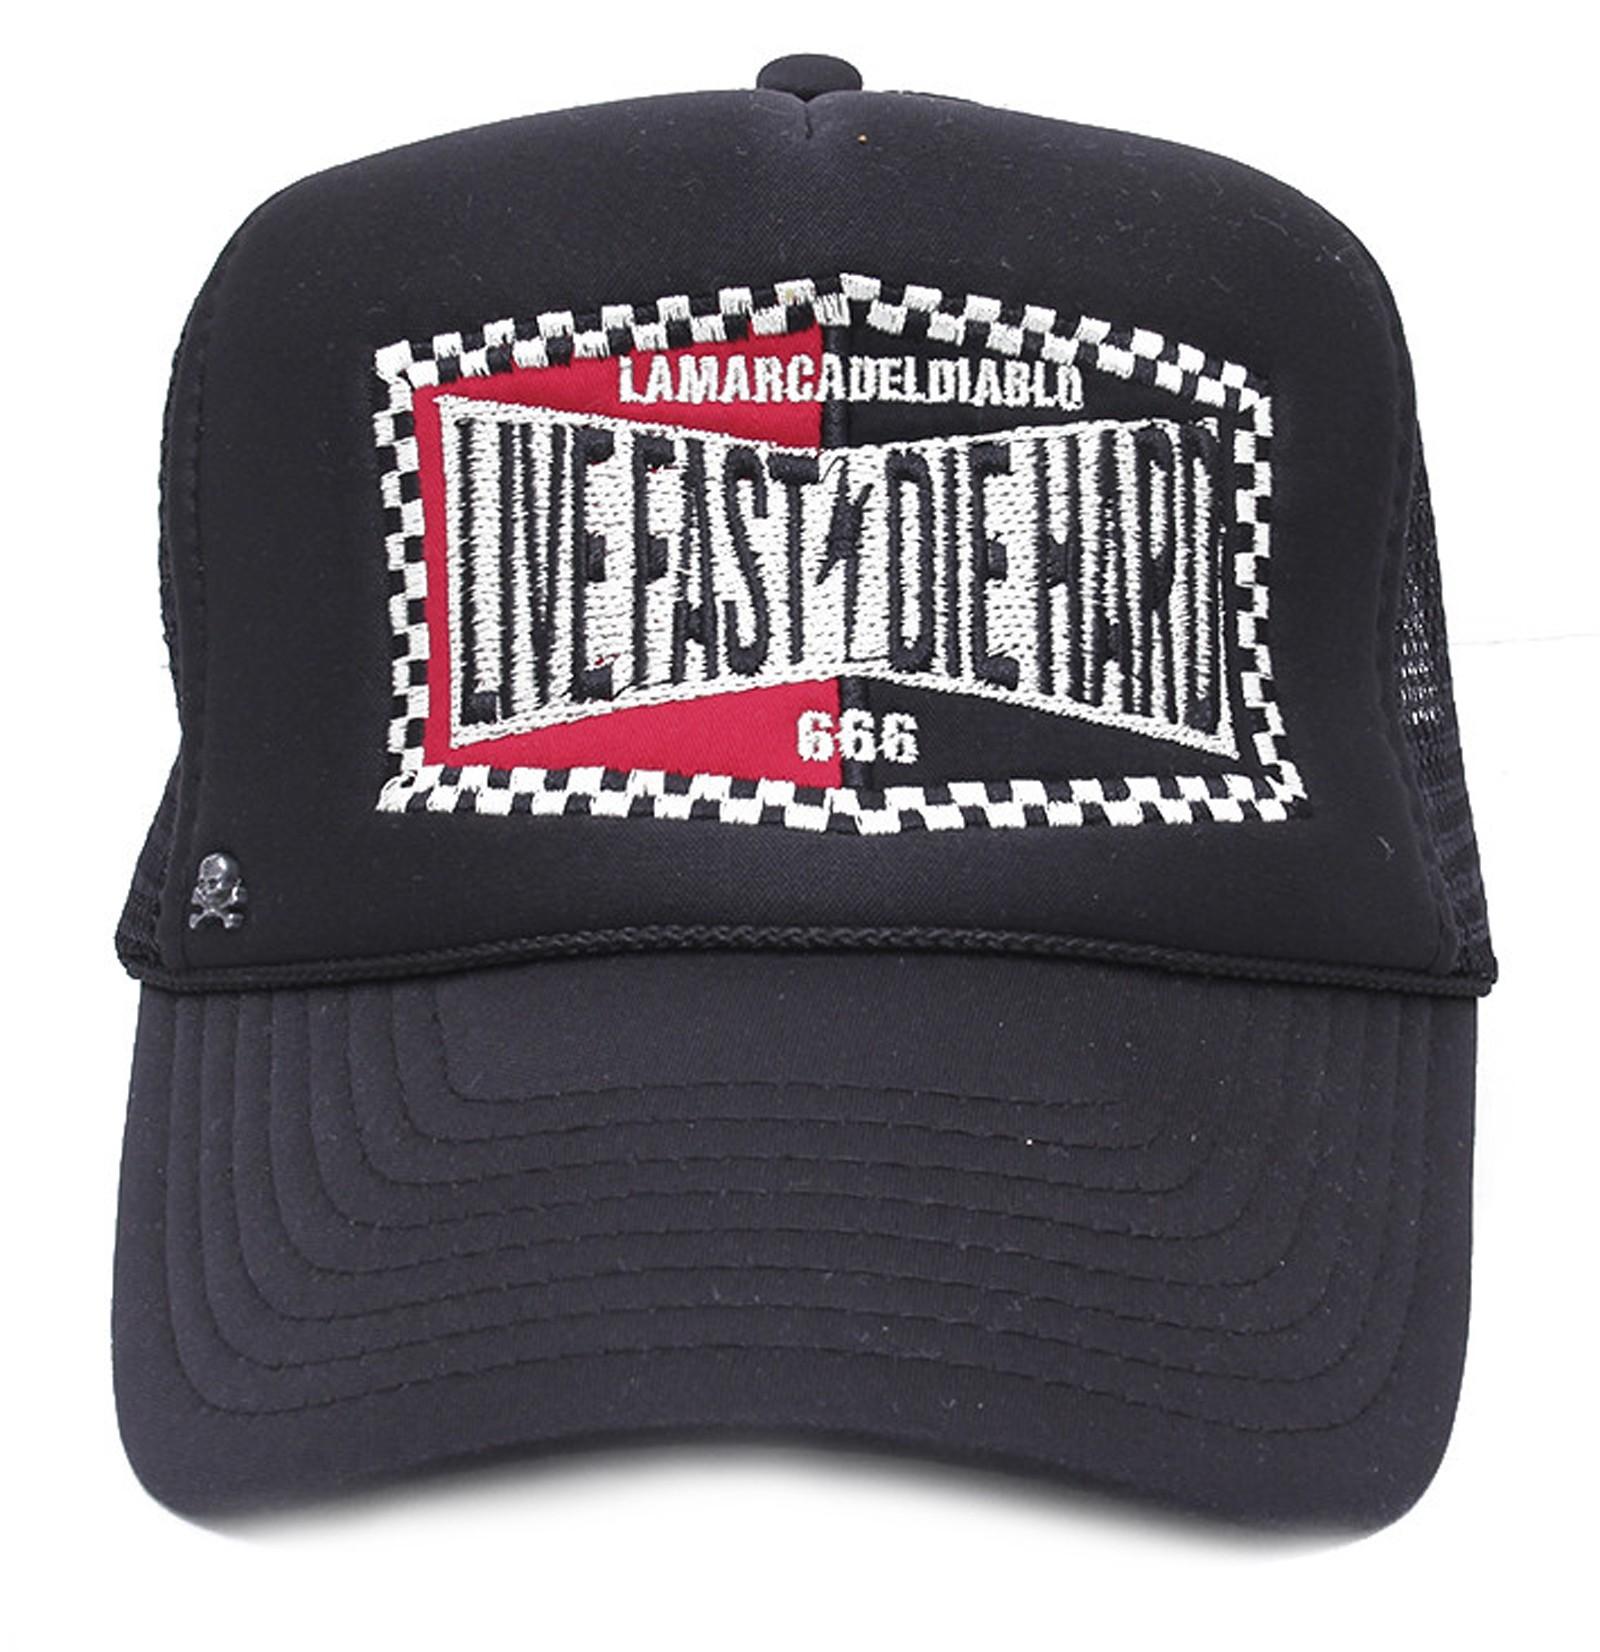 La Marca Del Diablo - Live Fast & Die Hard Trucker Cap Front